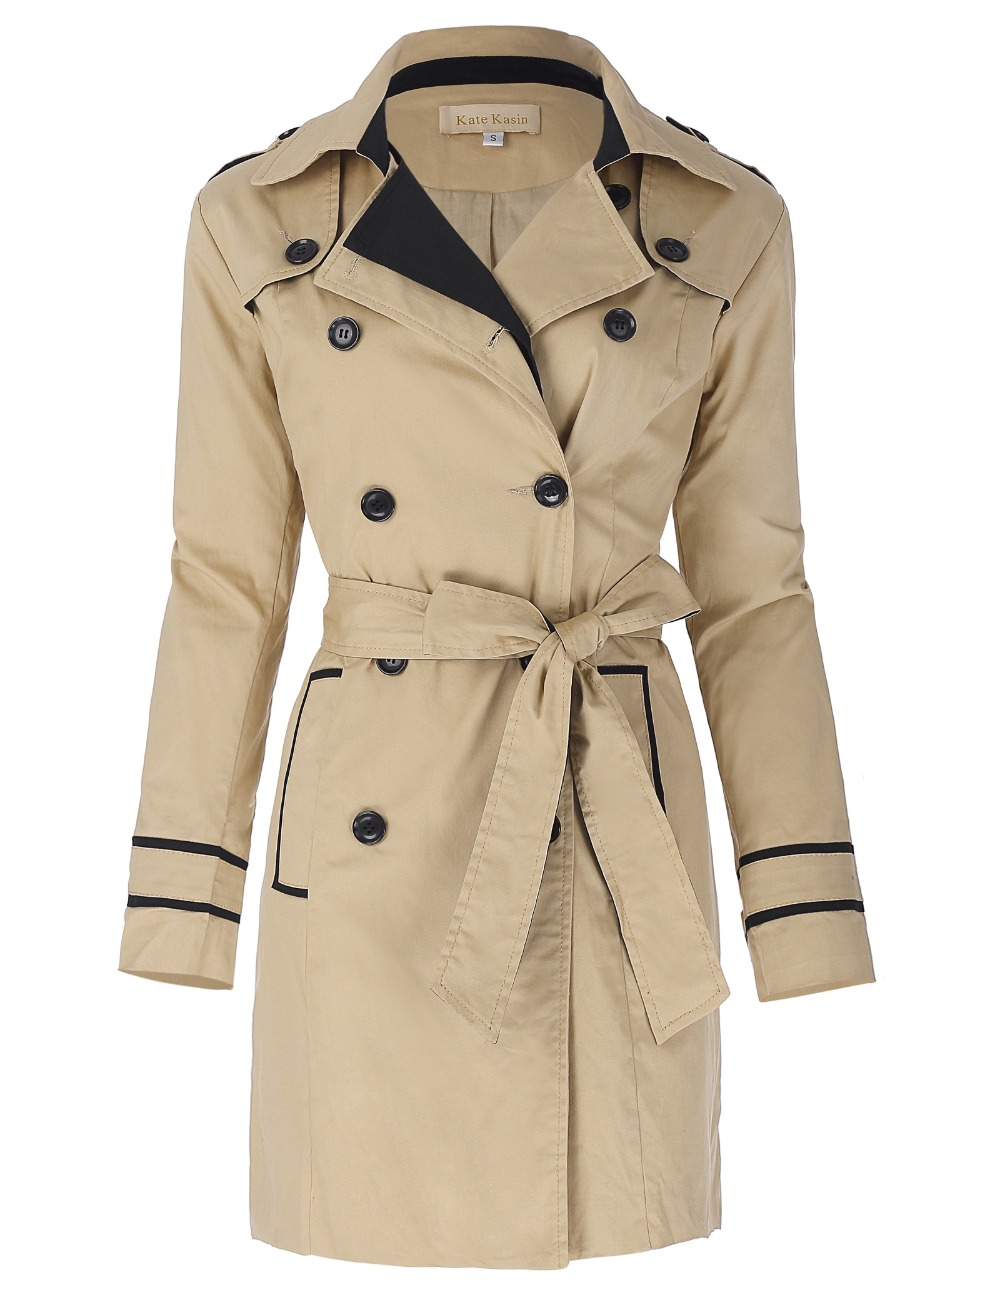 Double Breasted Trench Coat Women 2017 British Style Windbreaker Outerwear Anti-Wrinkle Water Proof Long Elegant Female Overcoat